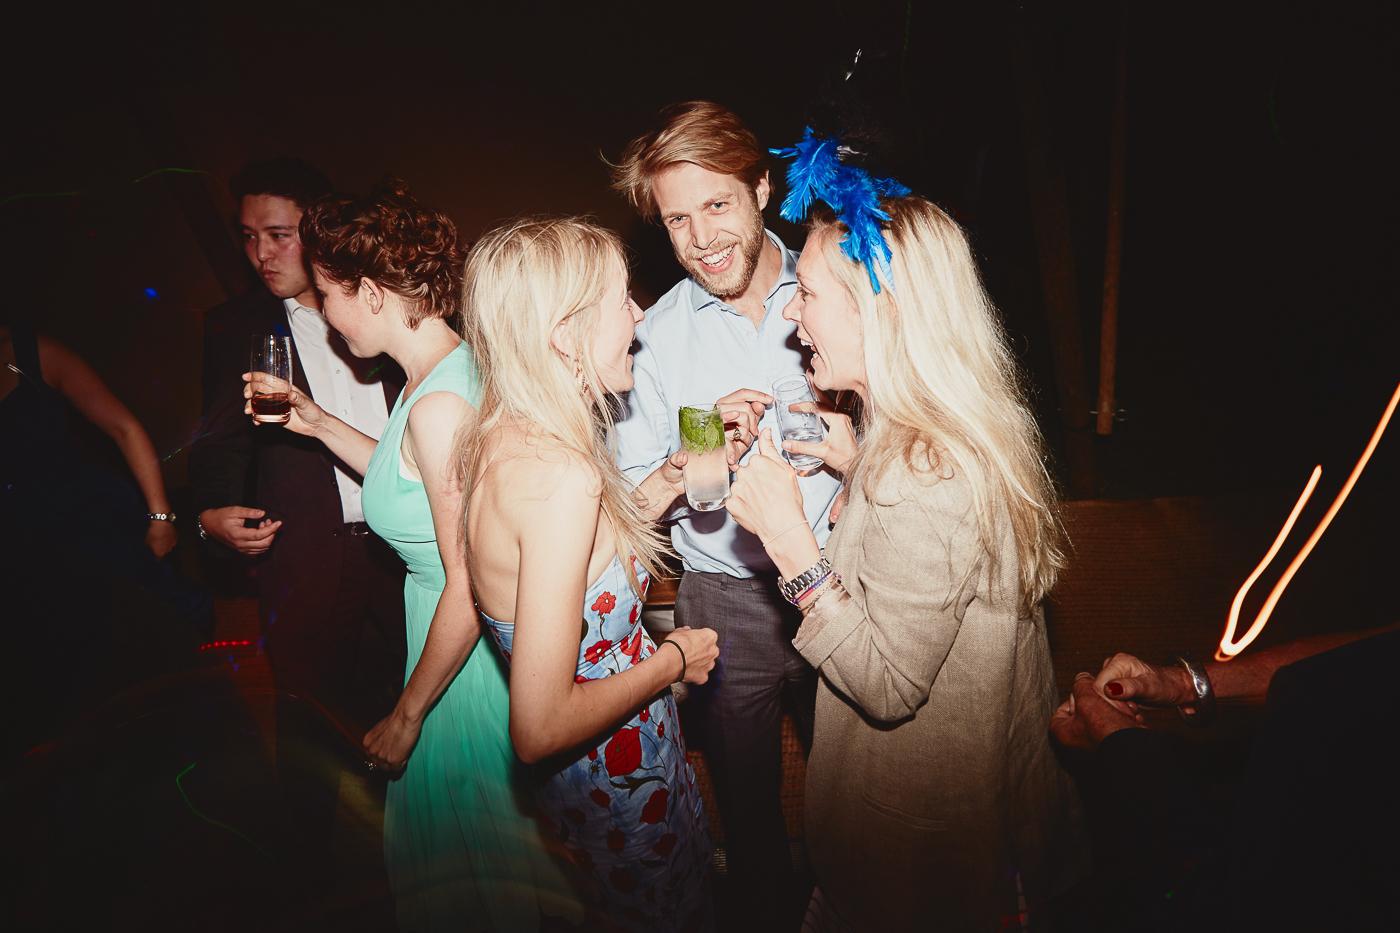 Danni_And_Jack_Gloucester_Wedding-162.jpg